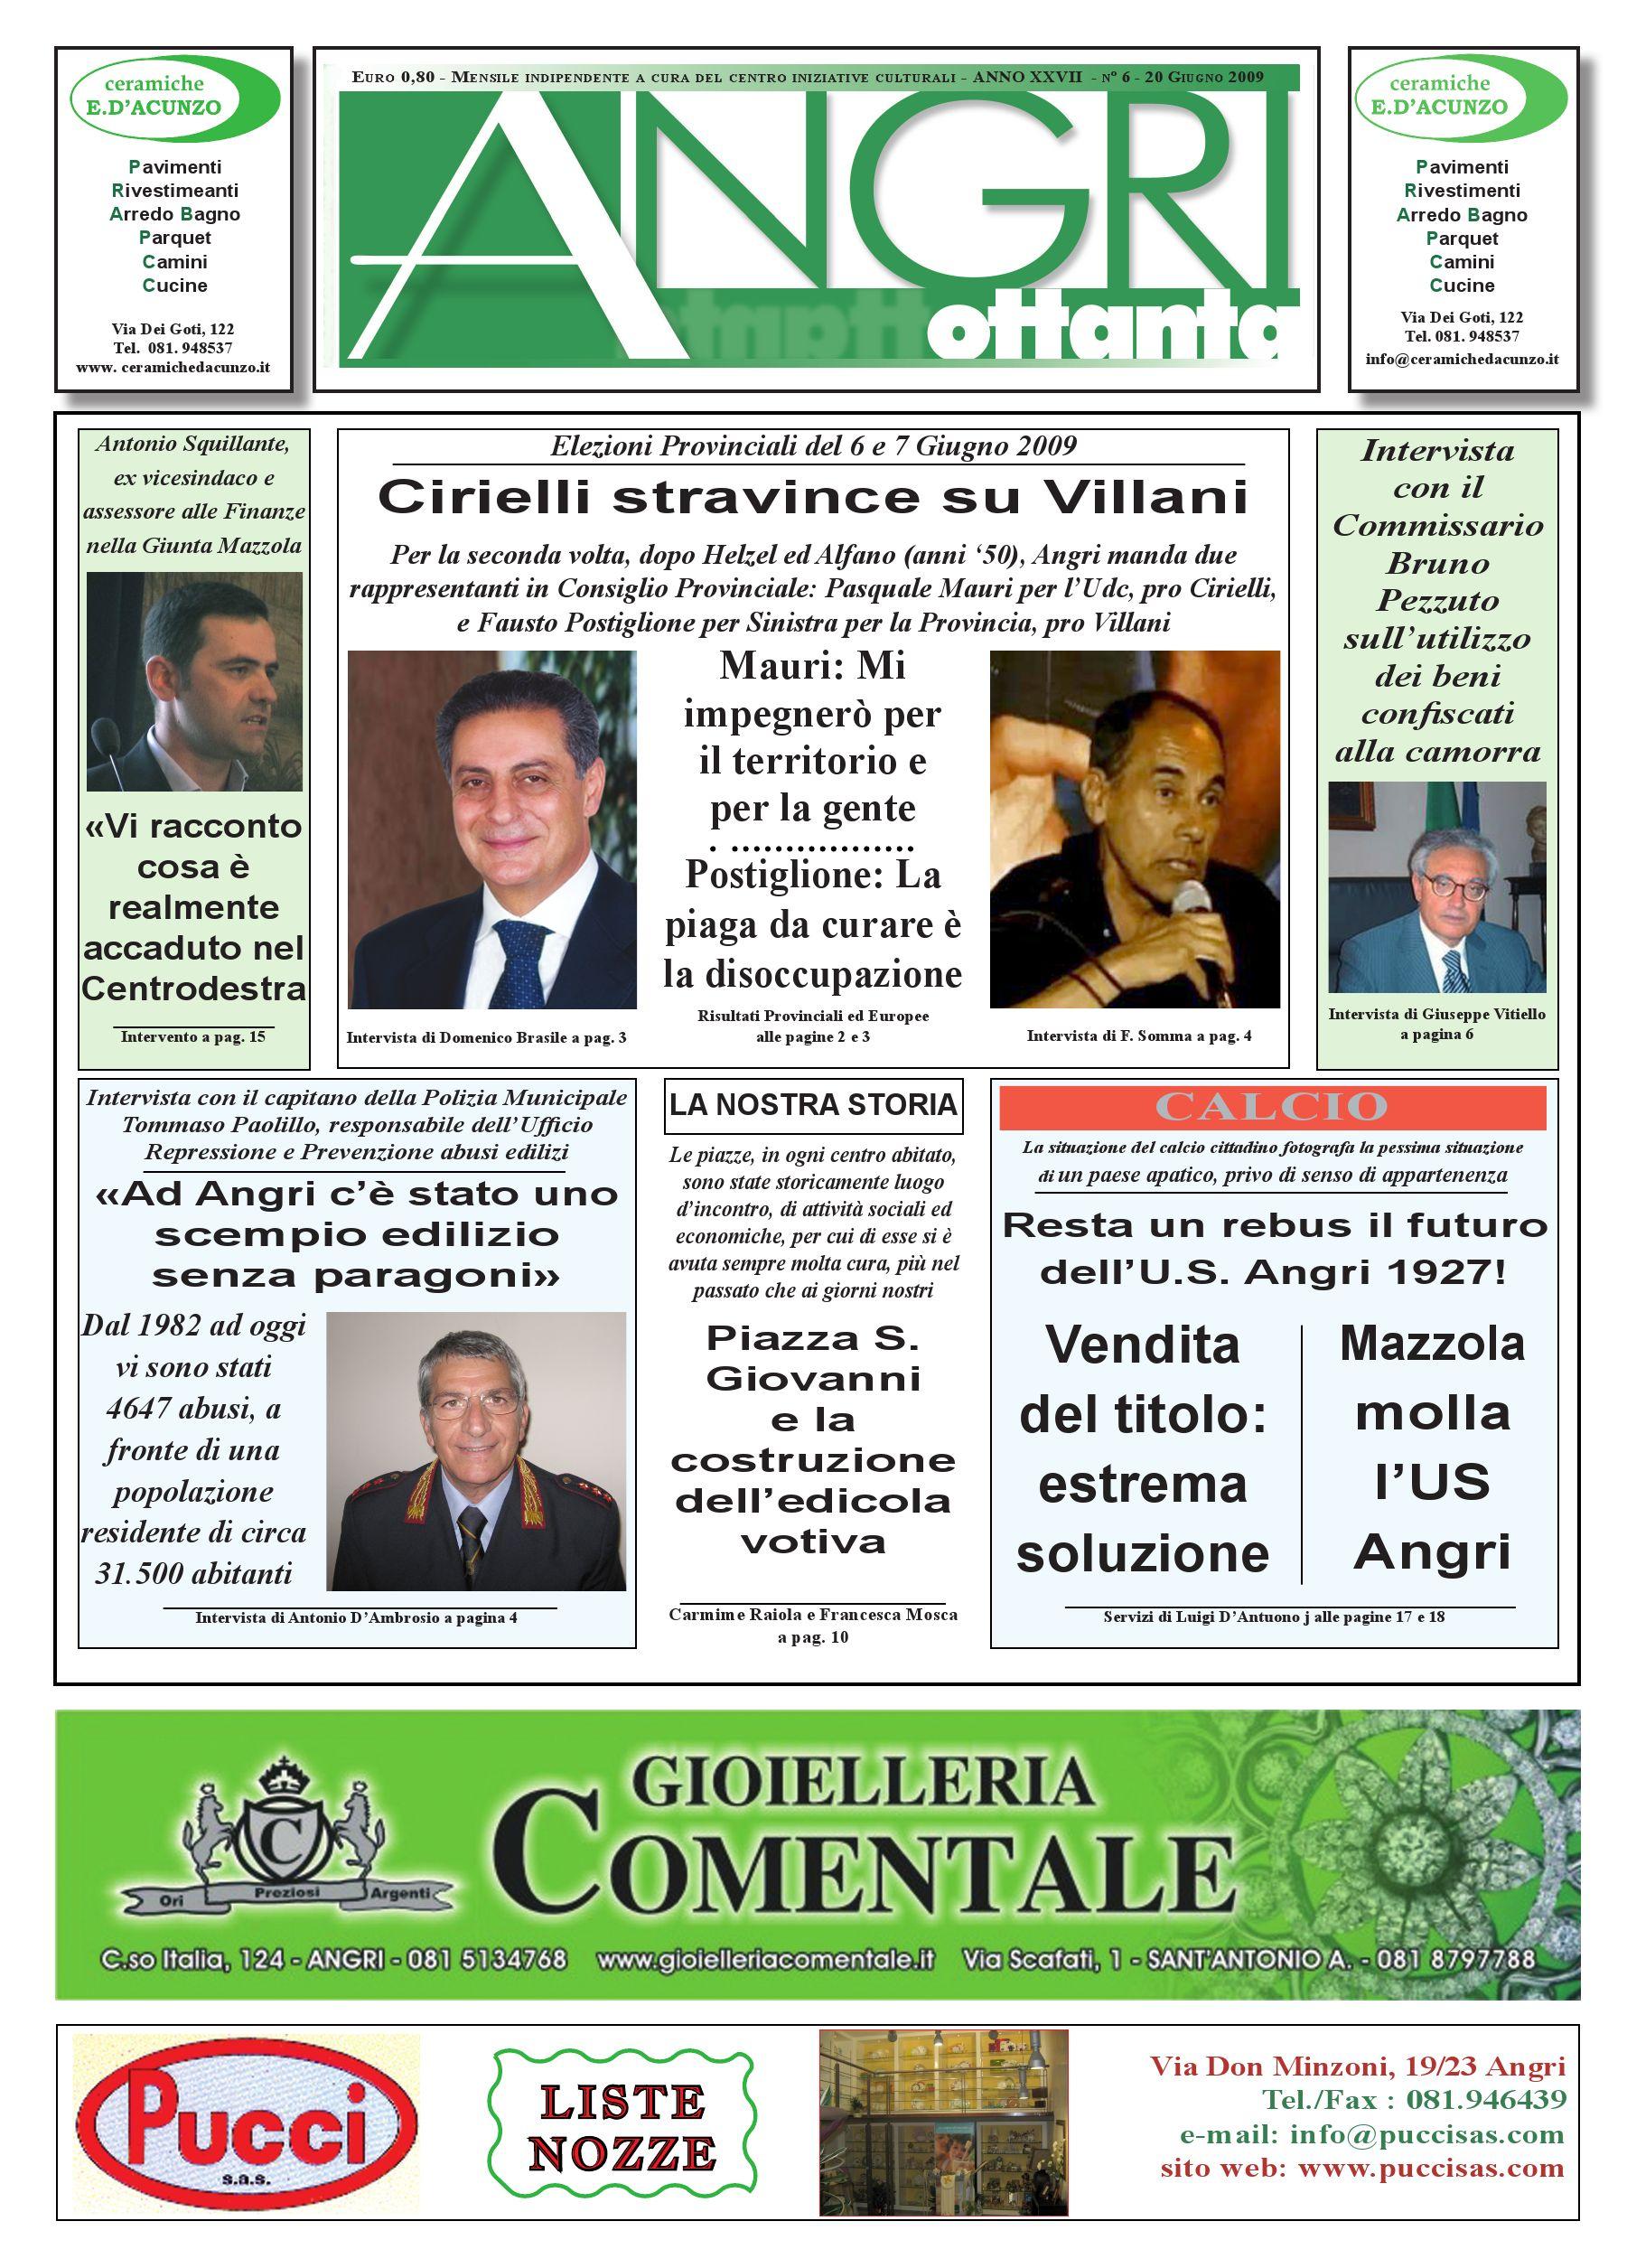 angri_80 by piazzadoria piazzadoria - issuu - Arredo Bagno Angri